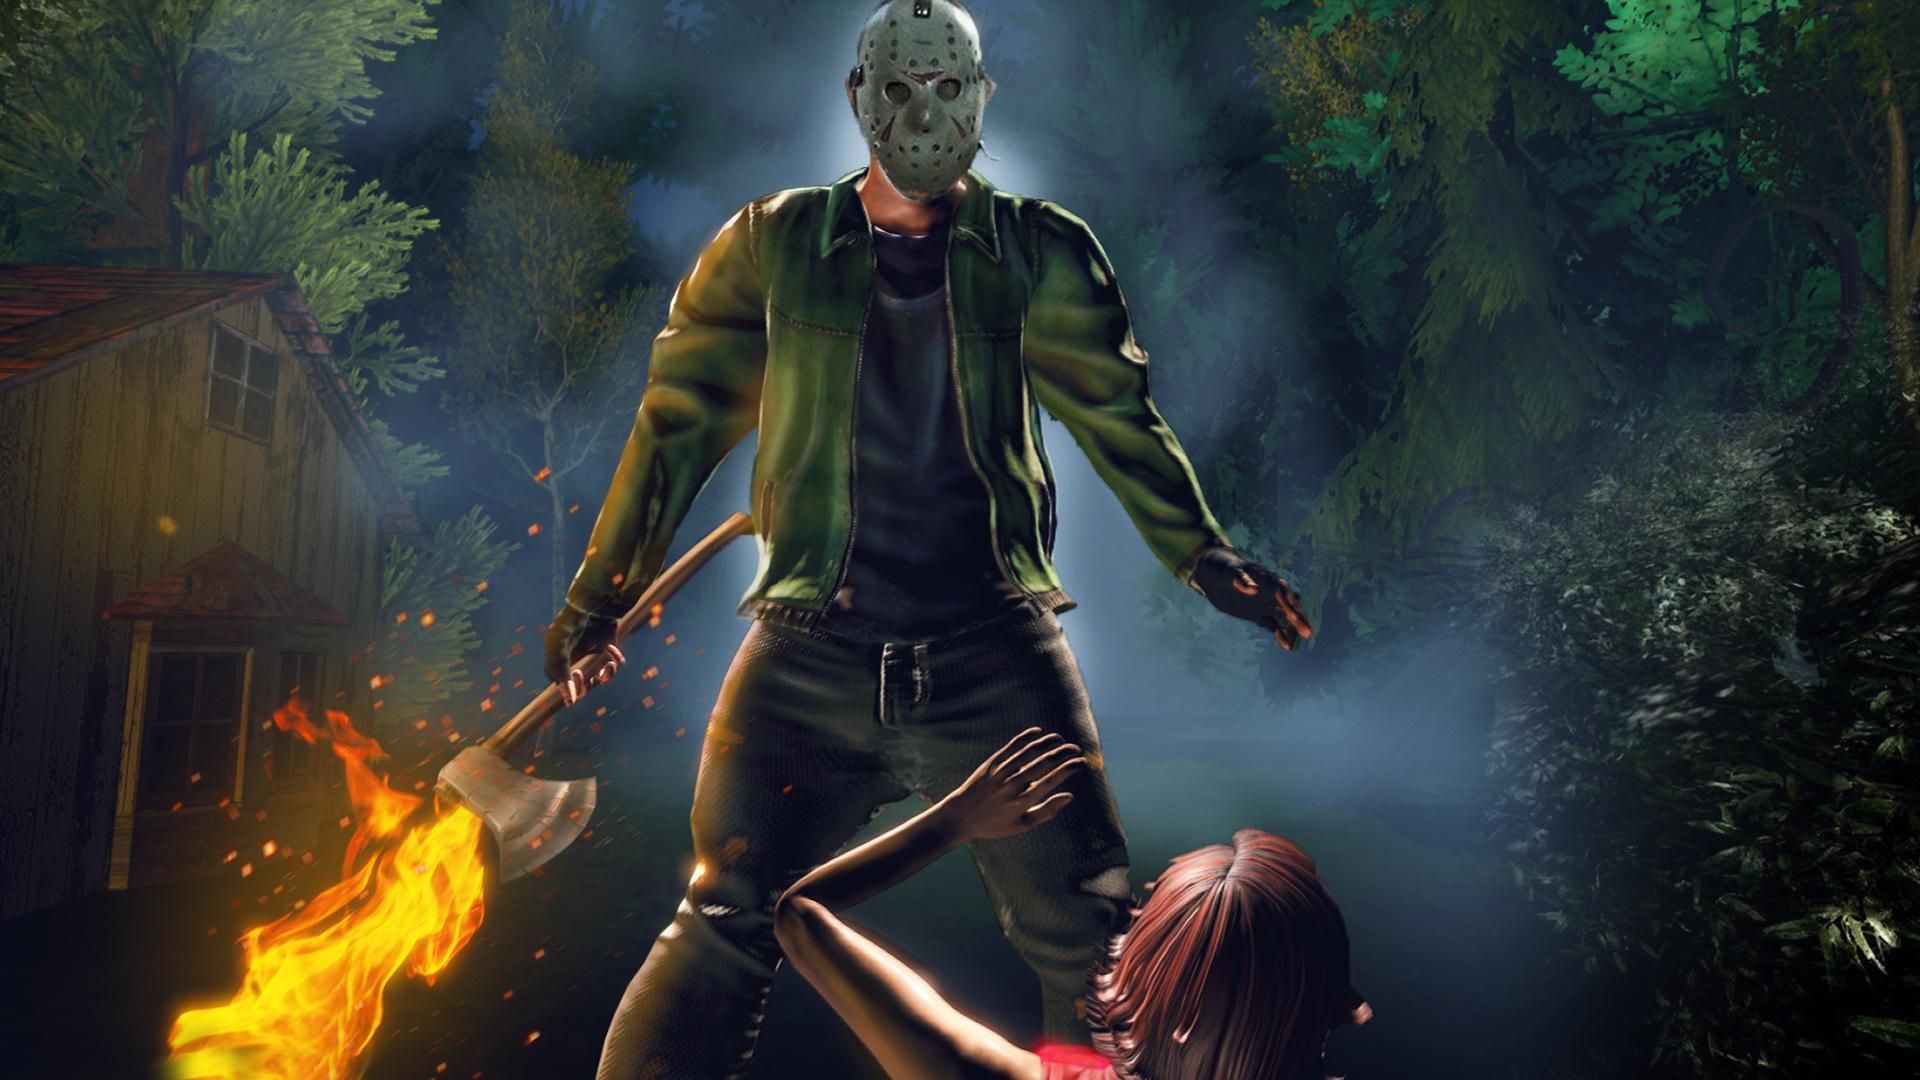 Endless Nightmare House 3D : Horror Friday Escape 1.1 Screenshot 8